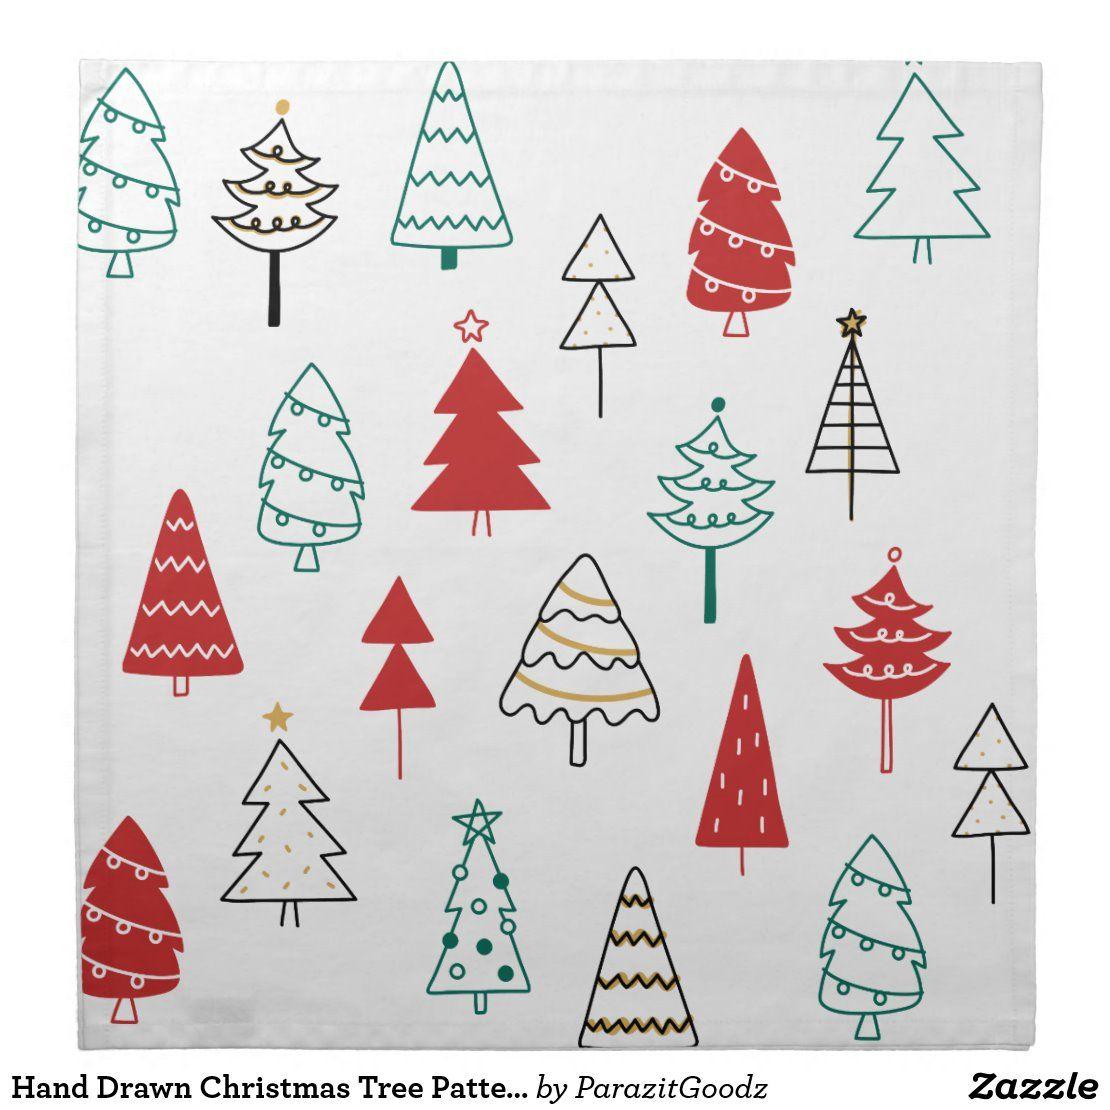 Hand Drawn Christmas Tree Pattern Cloth Napkin Zazzle Com In 2021 Christmas Tree Pattern Inflatable Decorations Tree Patterns